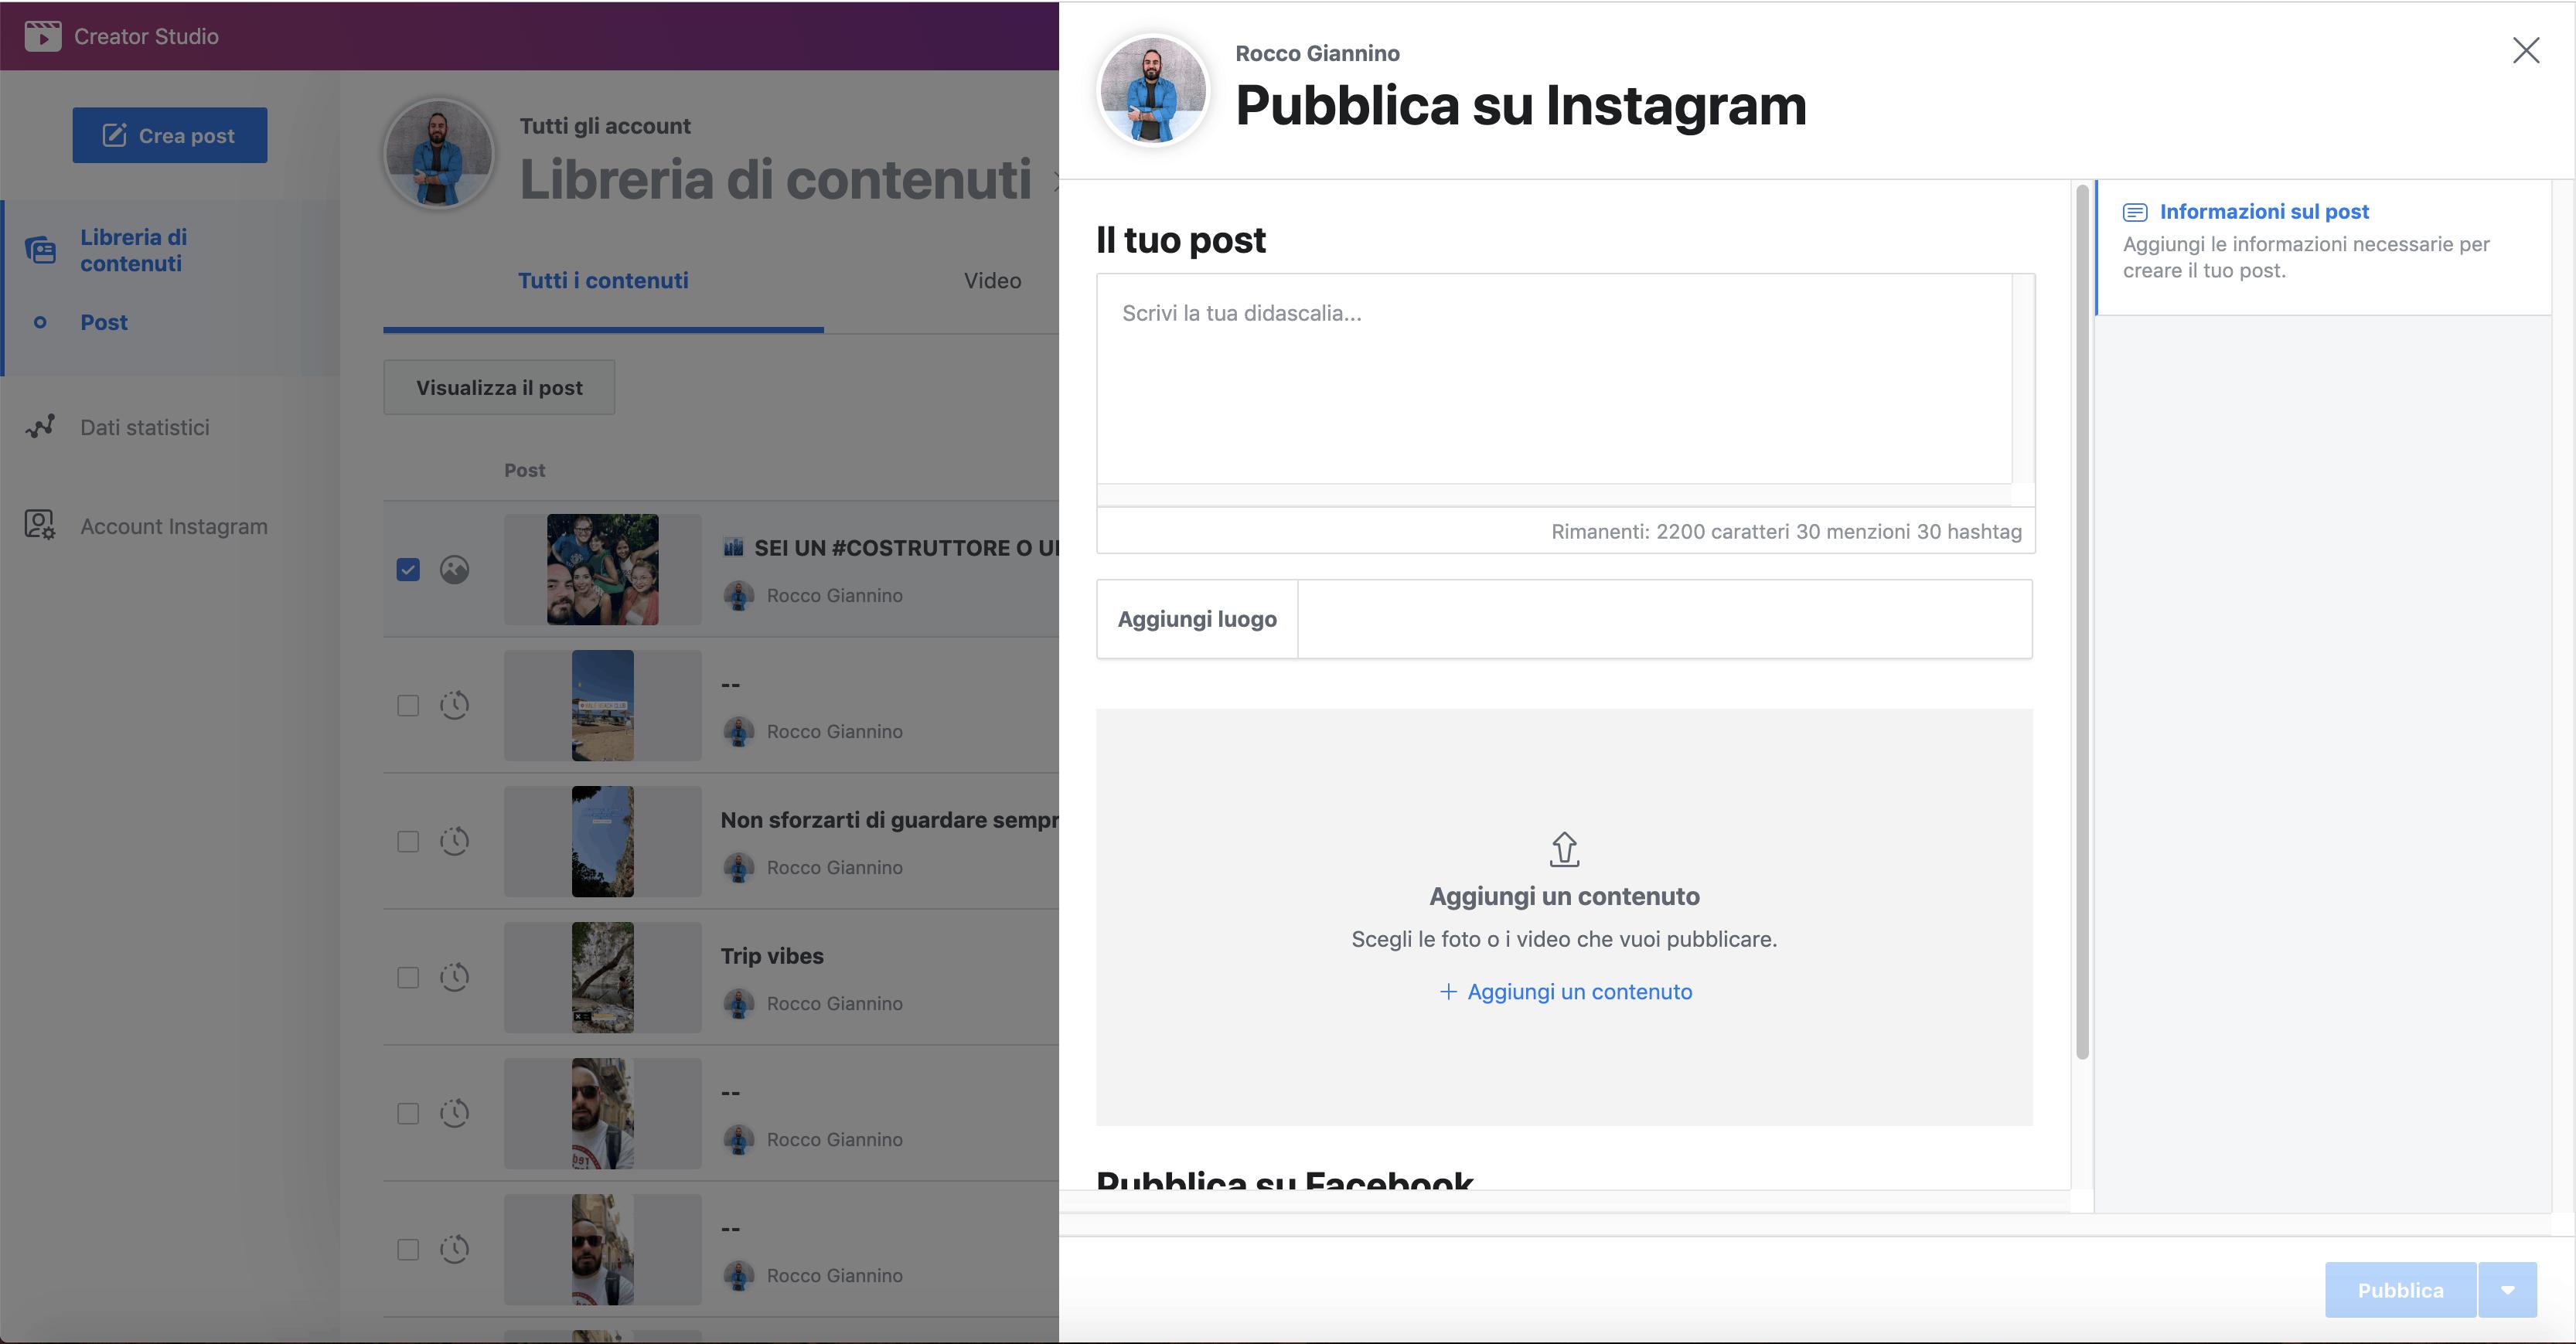 creator_studio_instagram_posting